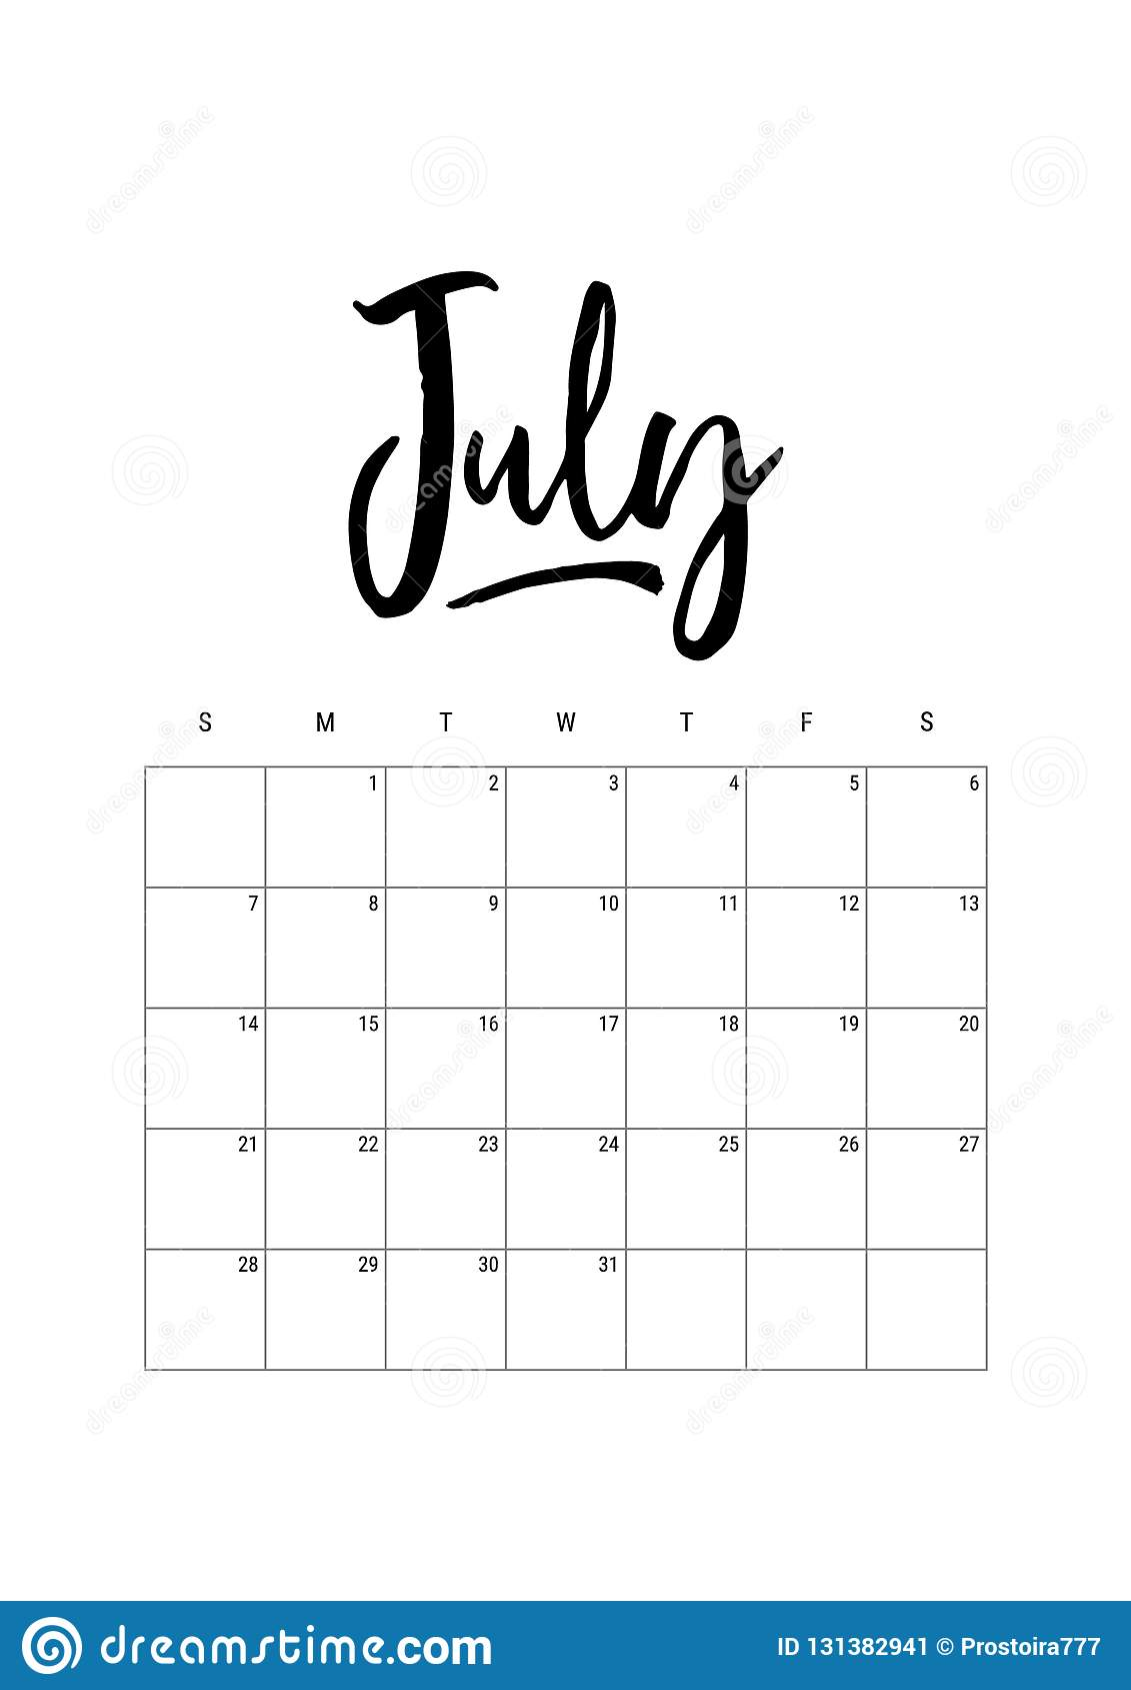 July Calendar Planner 2019 Week Starts On Sunday Part Of Sets Of